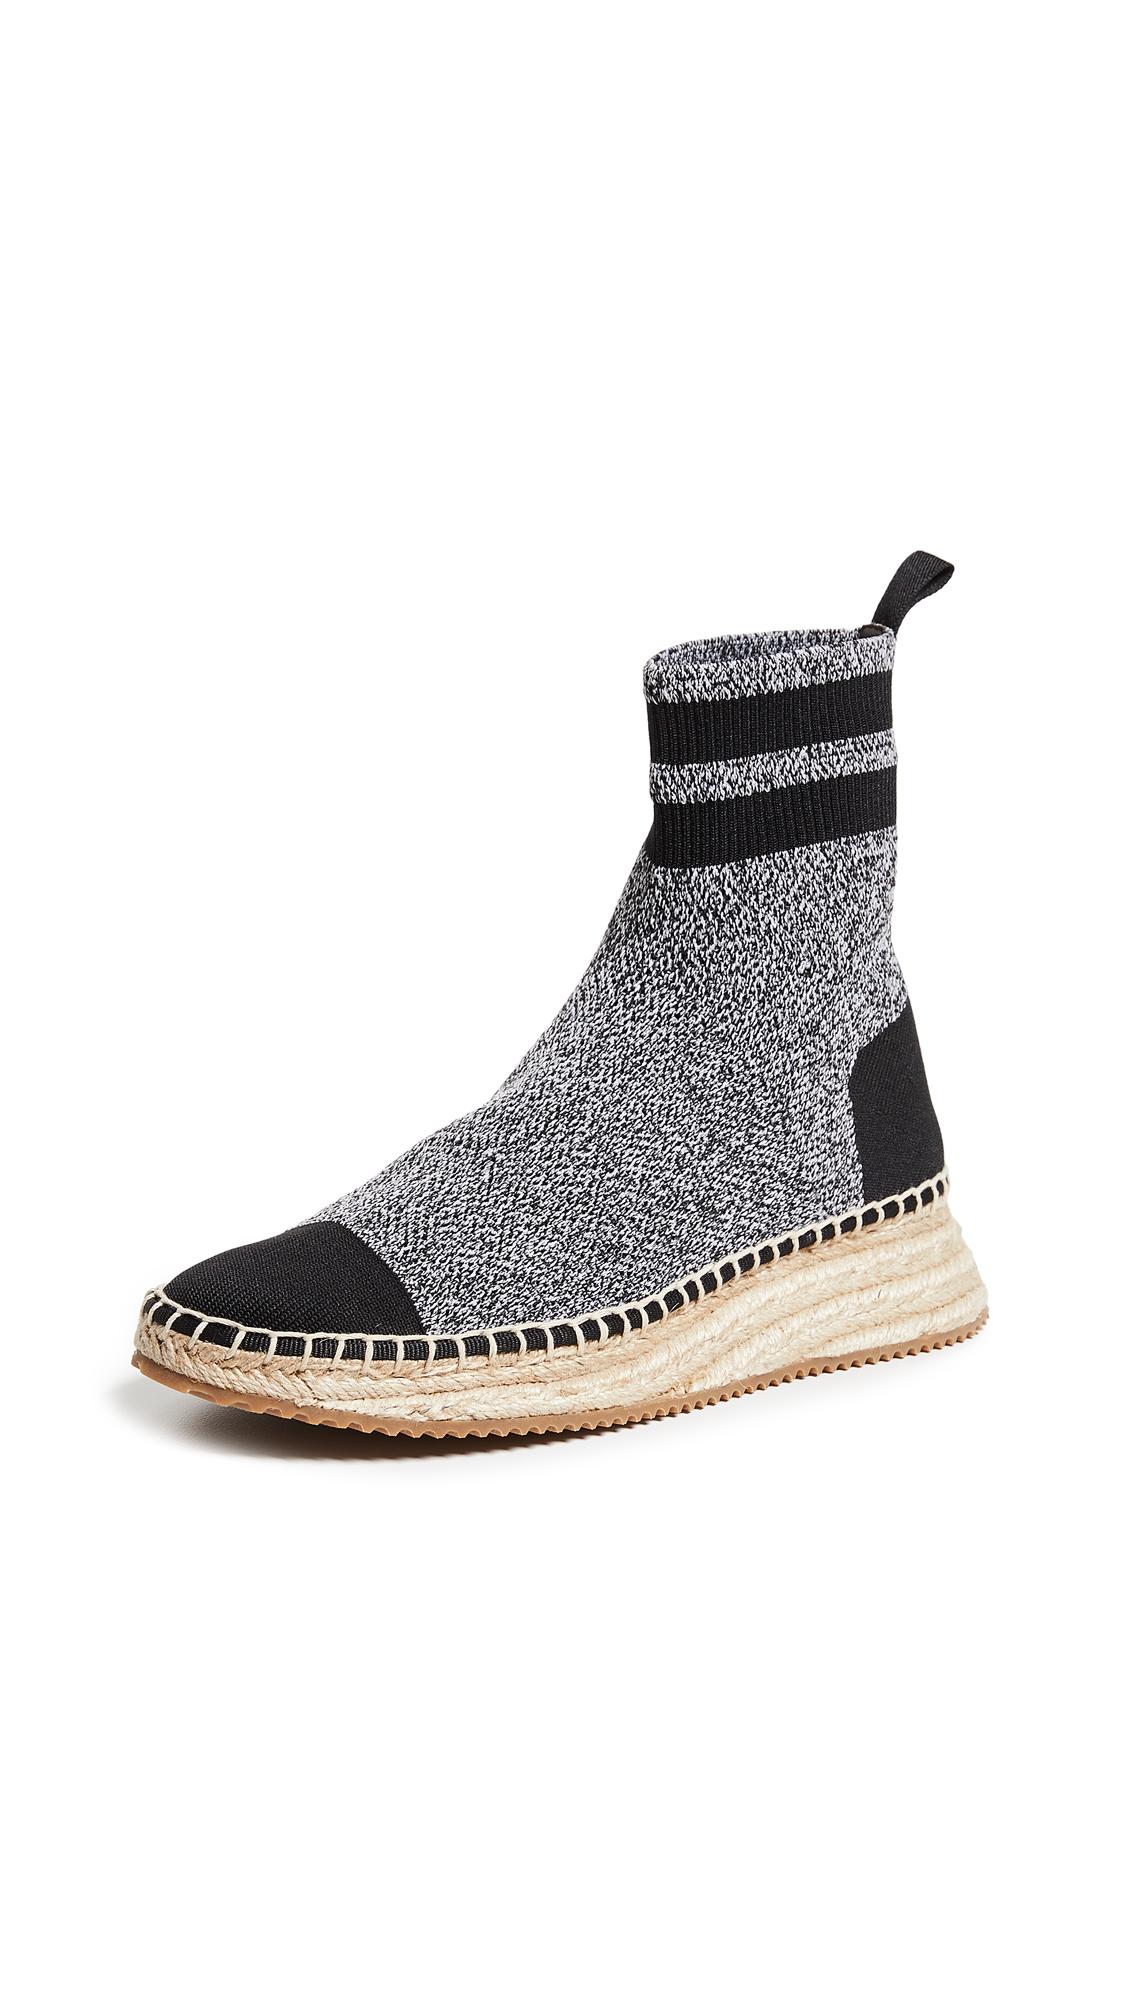 Alexander Wang Dylan Knit Espadrilles - Black/Grey